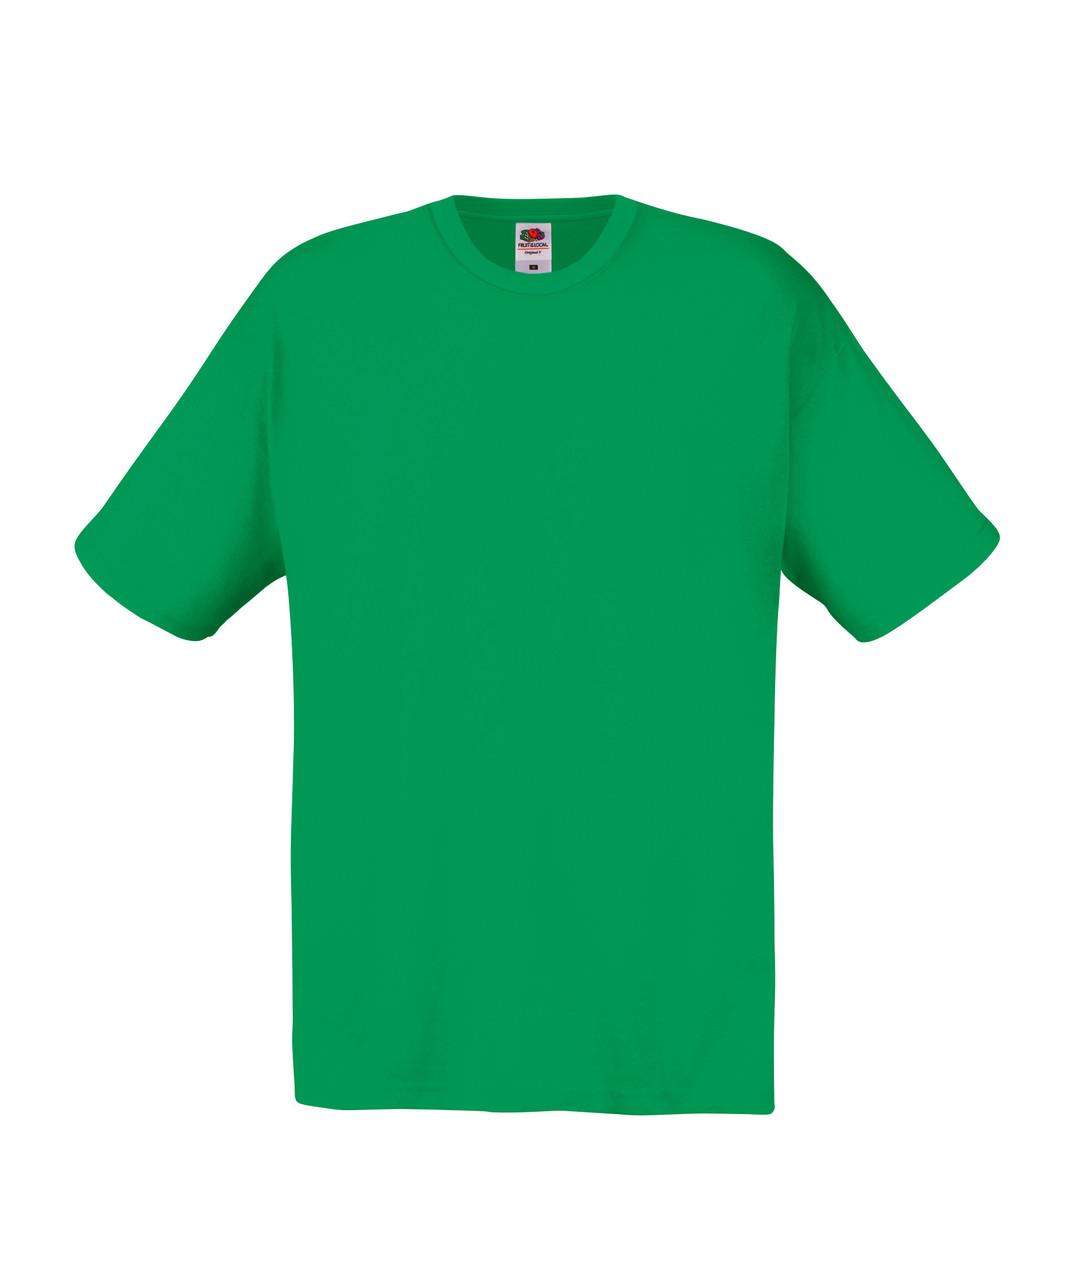 Мужская Футболка Лёгкая Fruit of the loom Ярко-Зелёный 61-082-47 Xxl